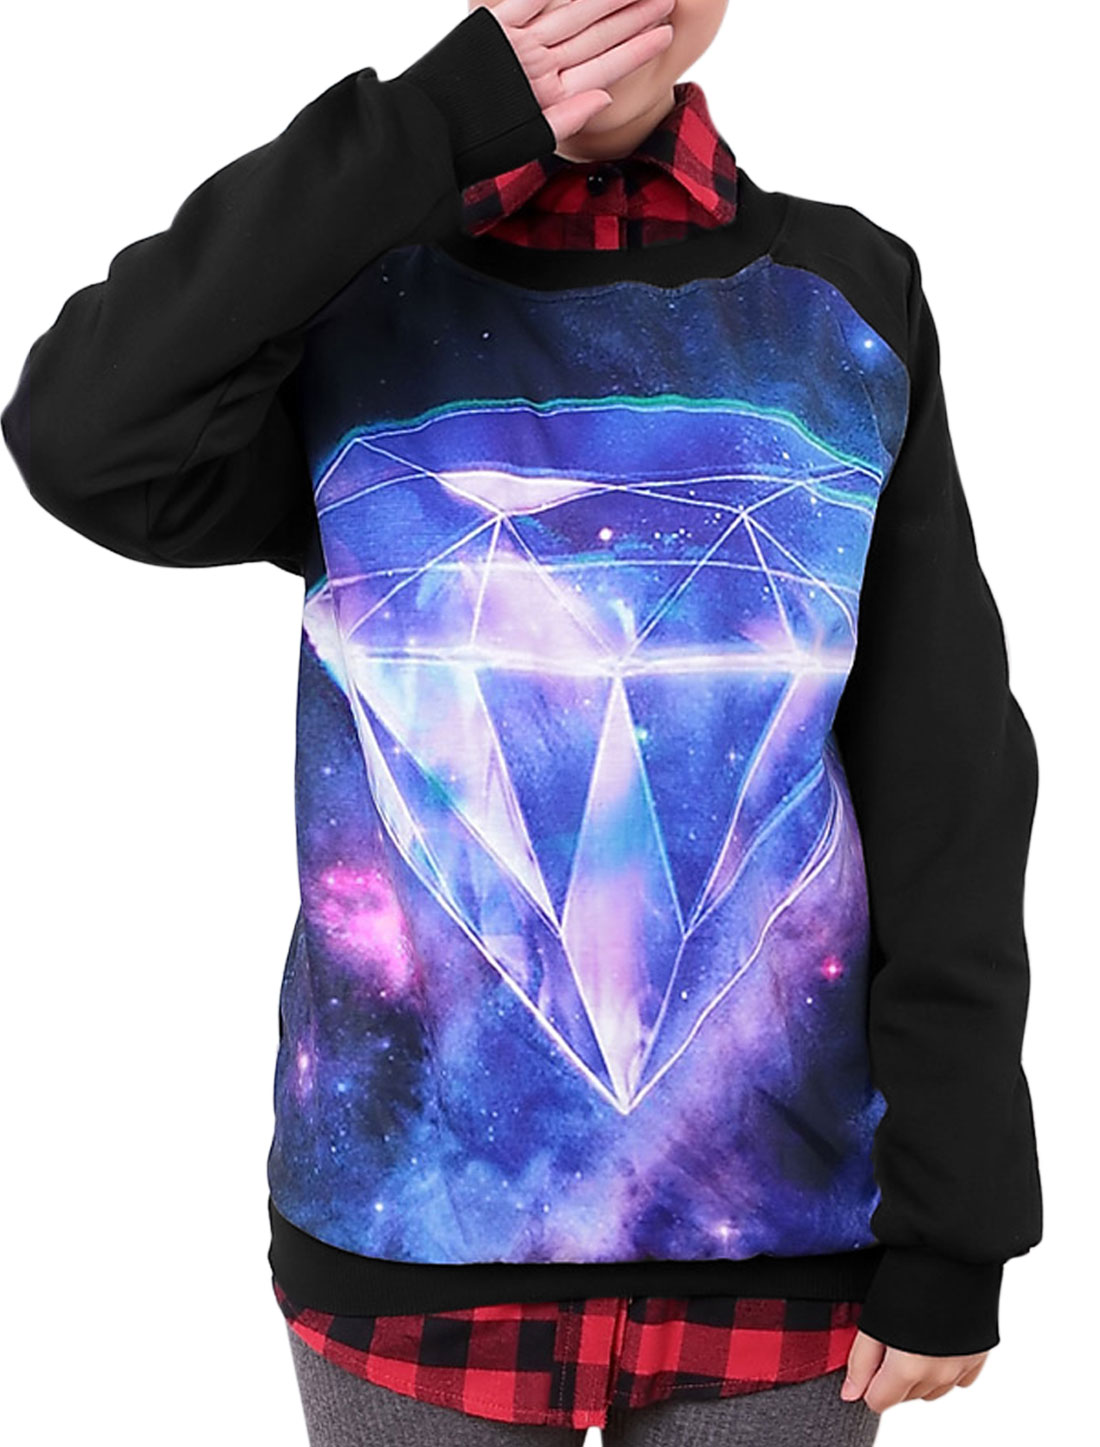 Women Diamond Pattern Raglan Sleeve Ribbed Hem Casual T-shirt Black XS